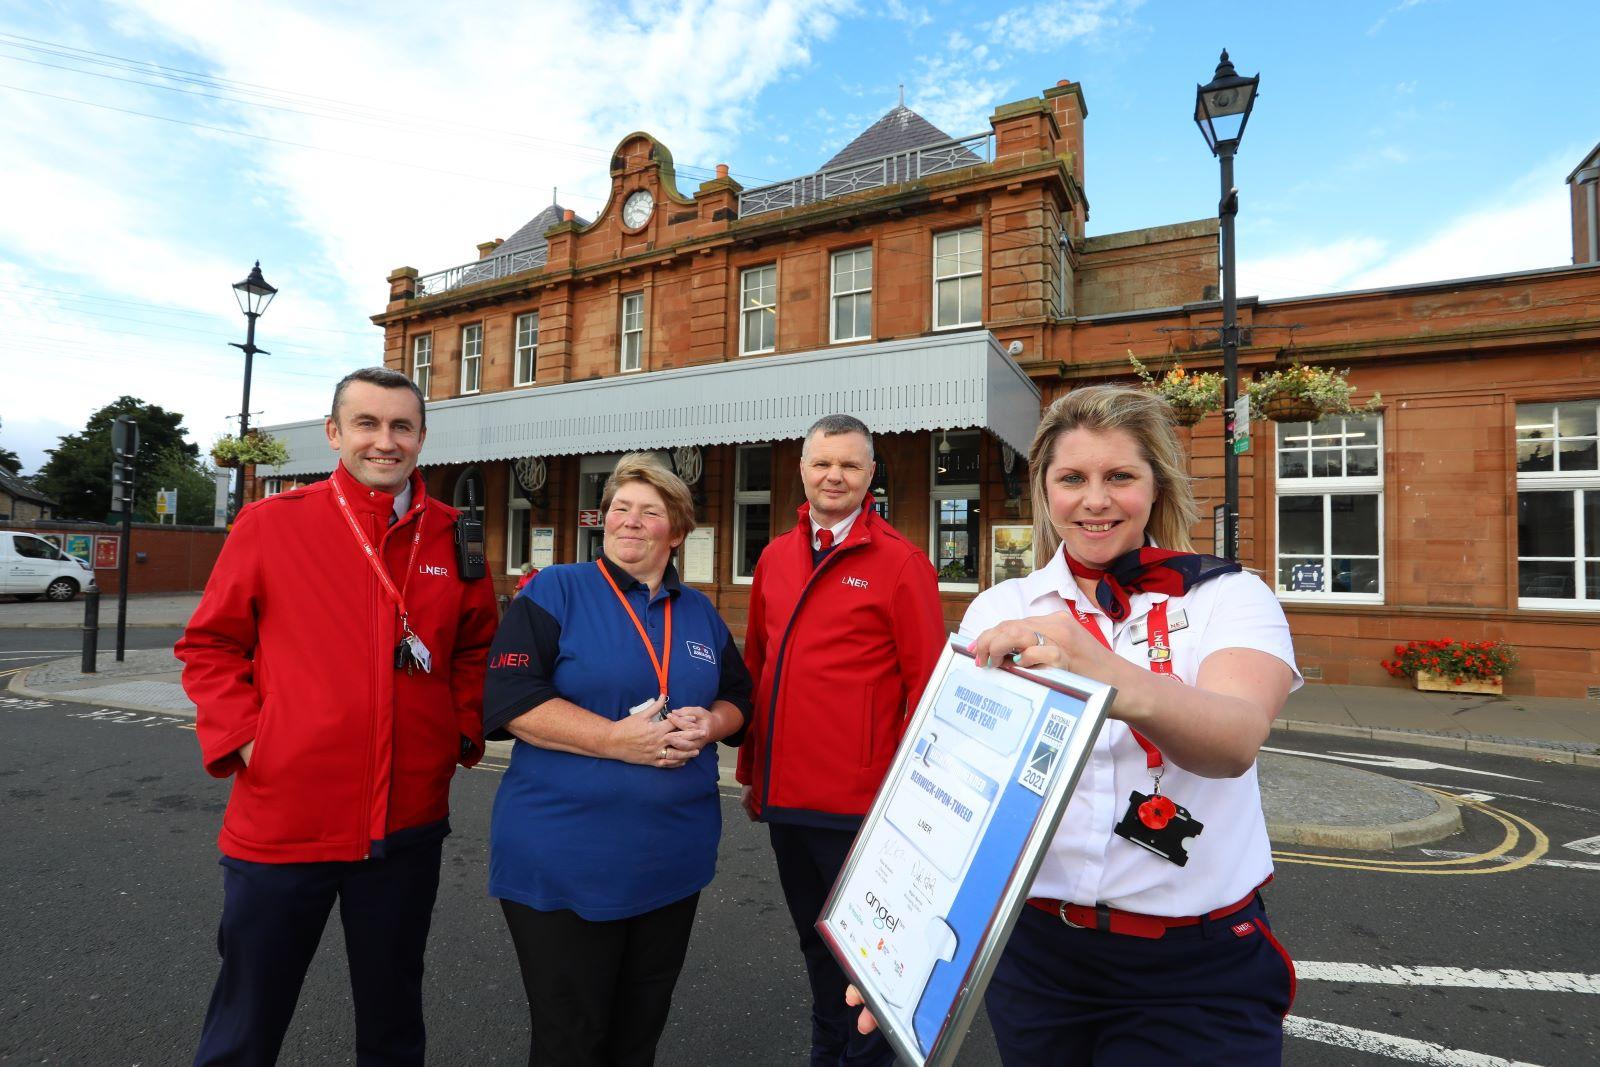 Berwick-Upon-Tweed StationRecognised In Prestigious National Rail Awards